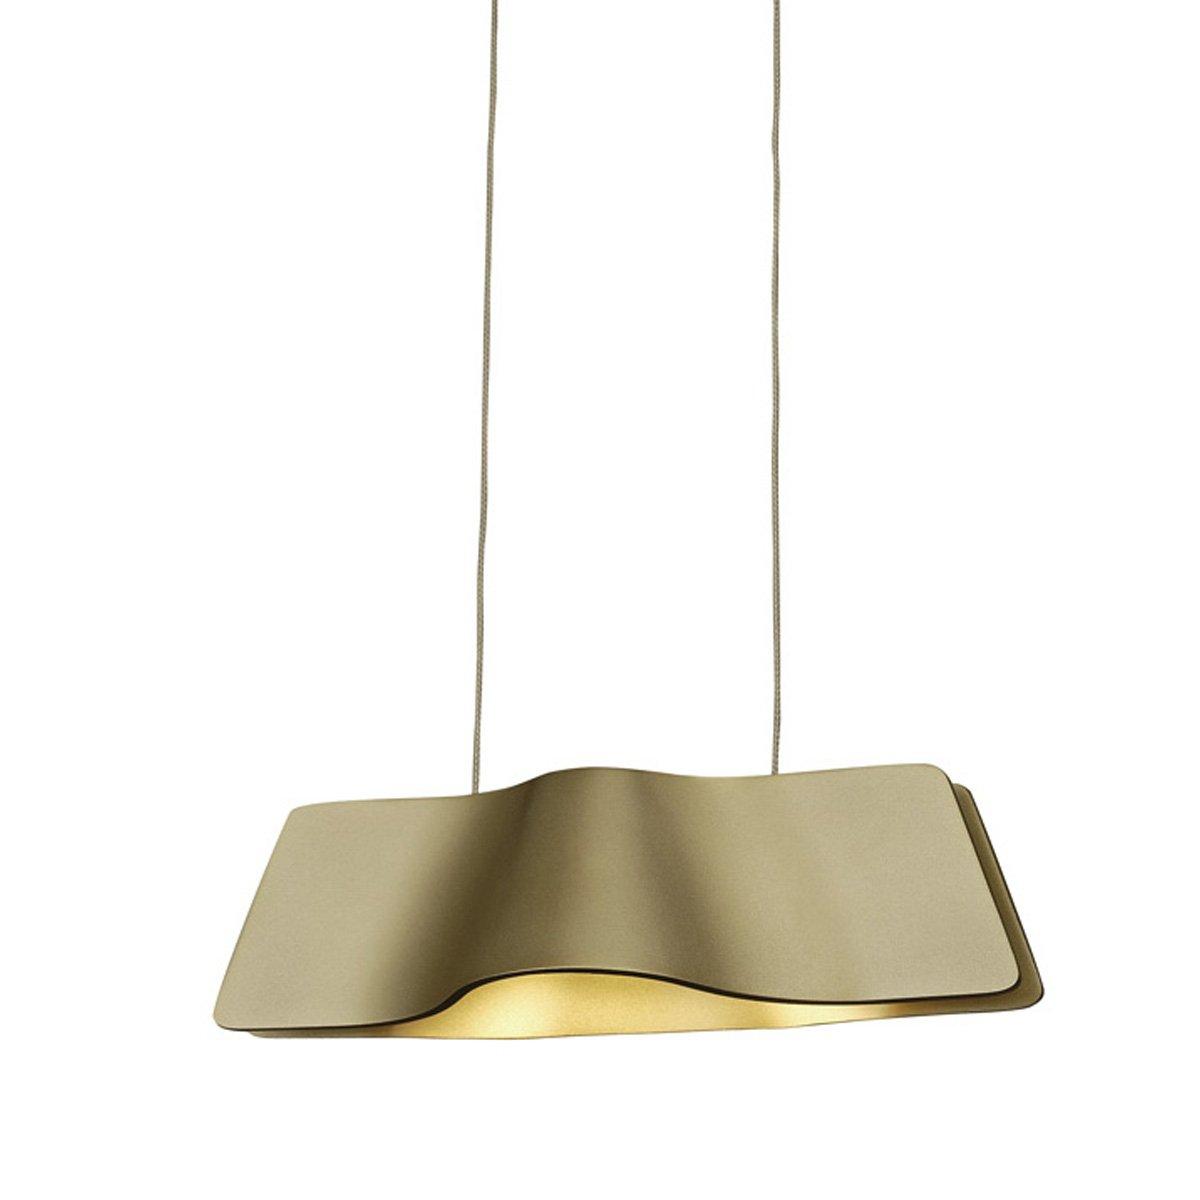 SLV - verlichting Hanglamp Wave Pendant SLV. 147833